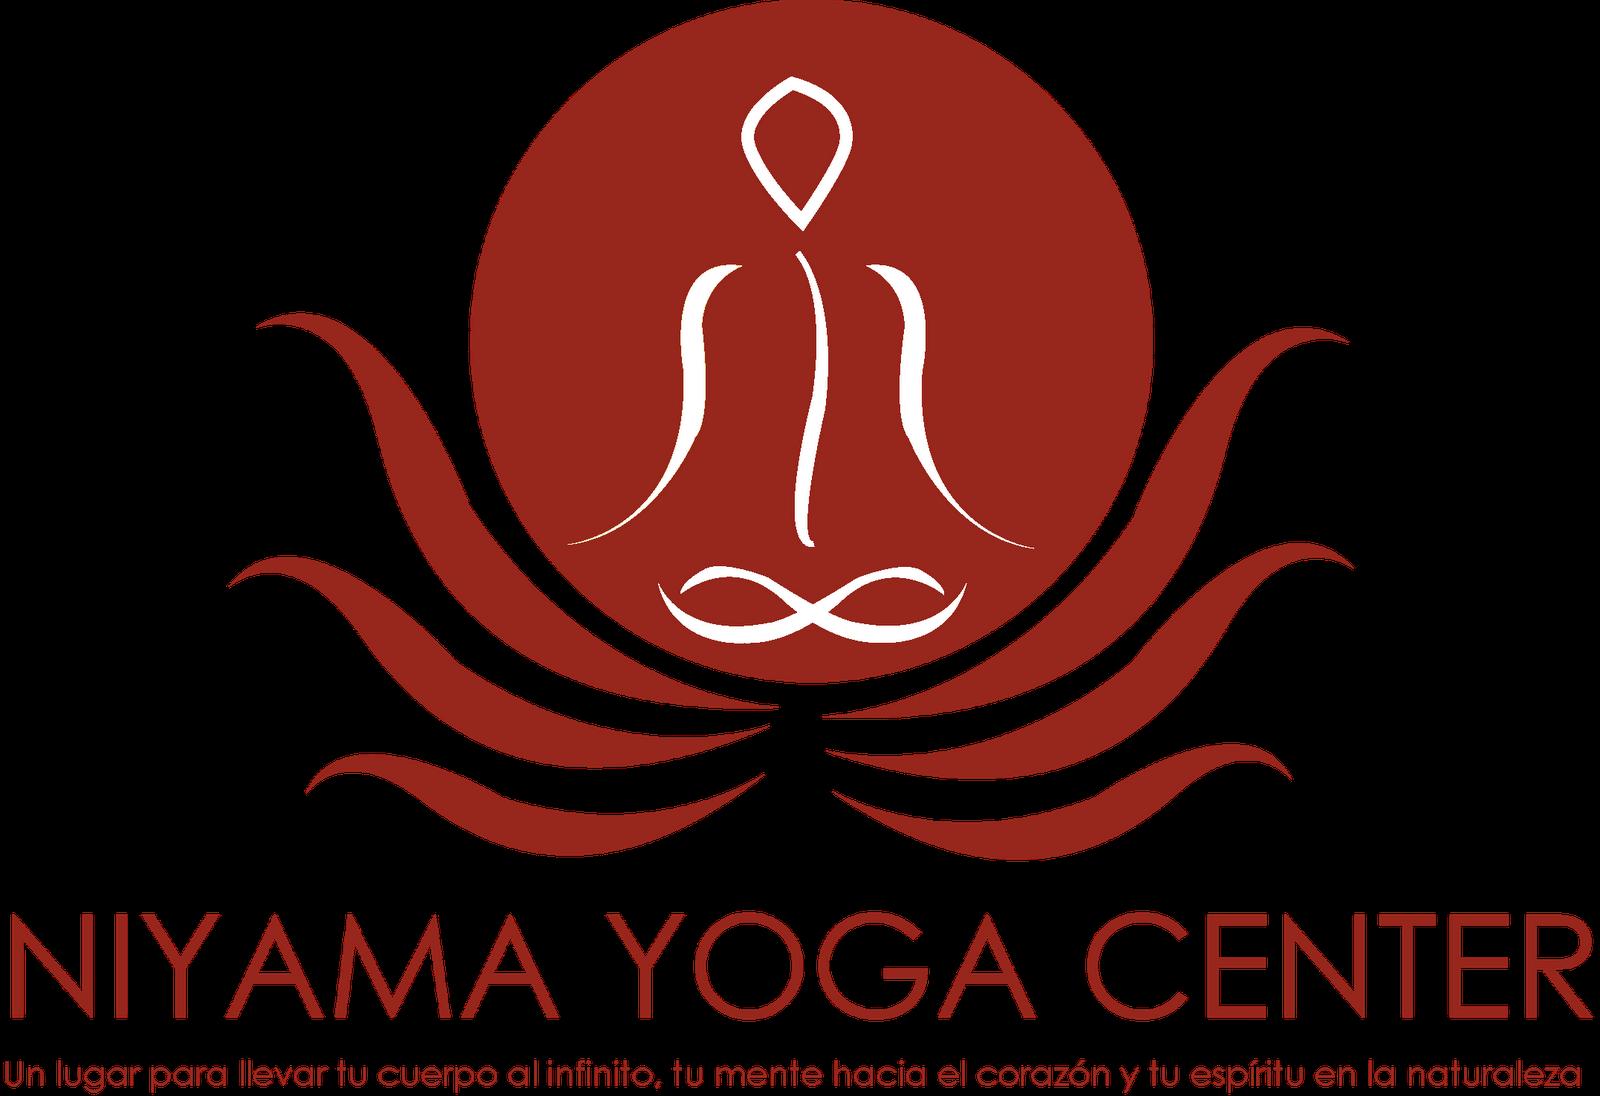 niyama yoga center videos especiales